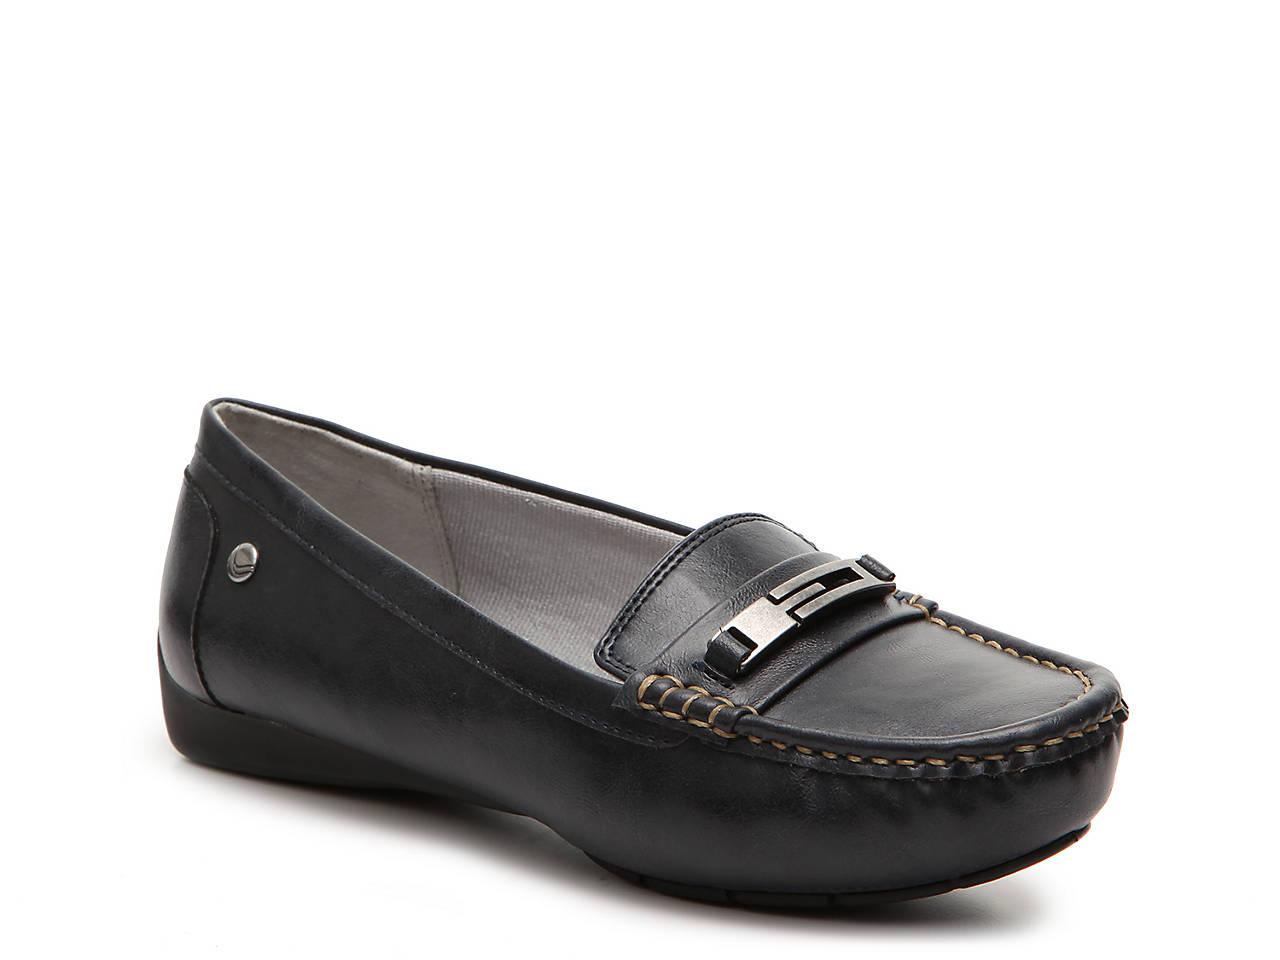 Viva Loafer